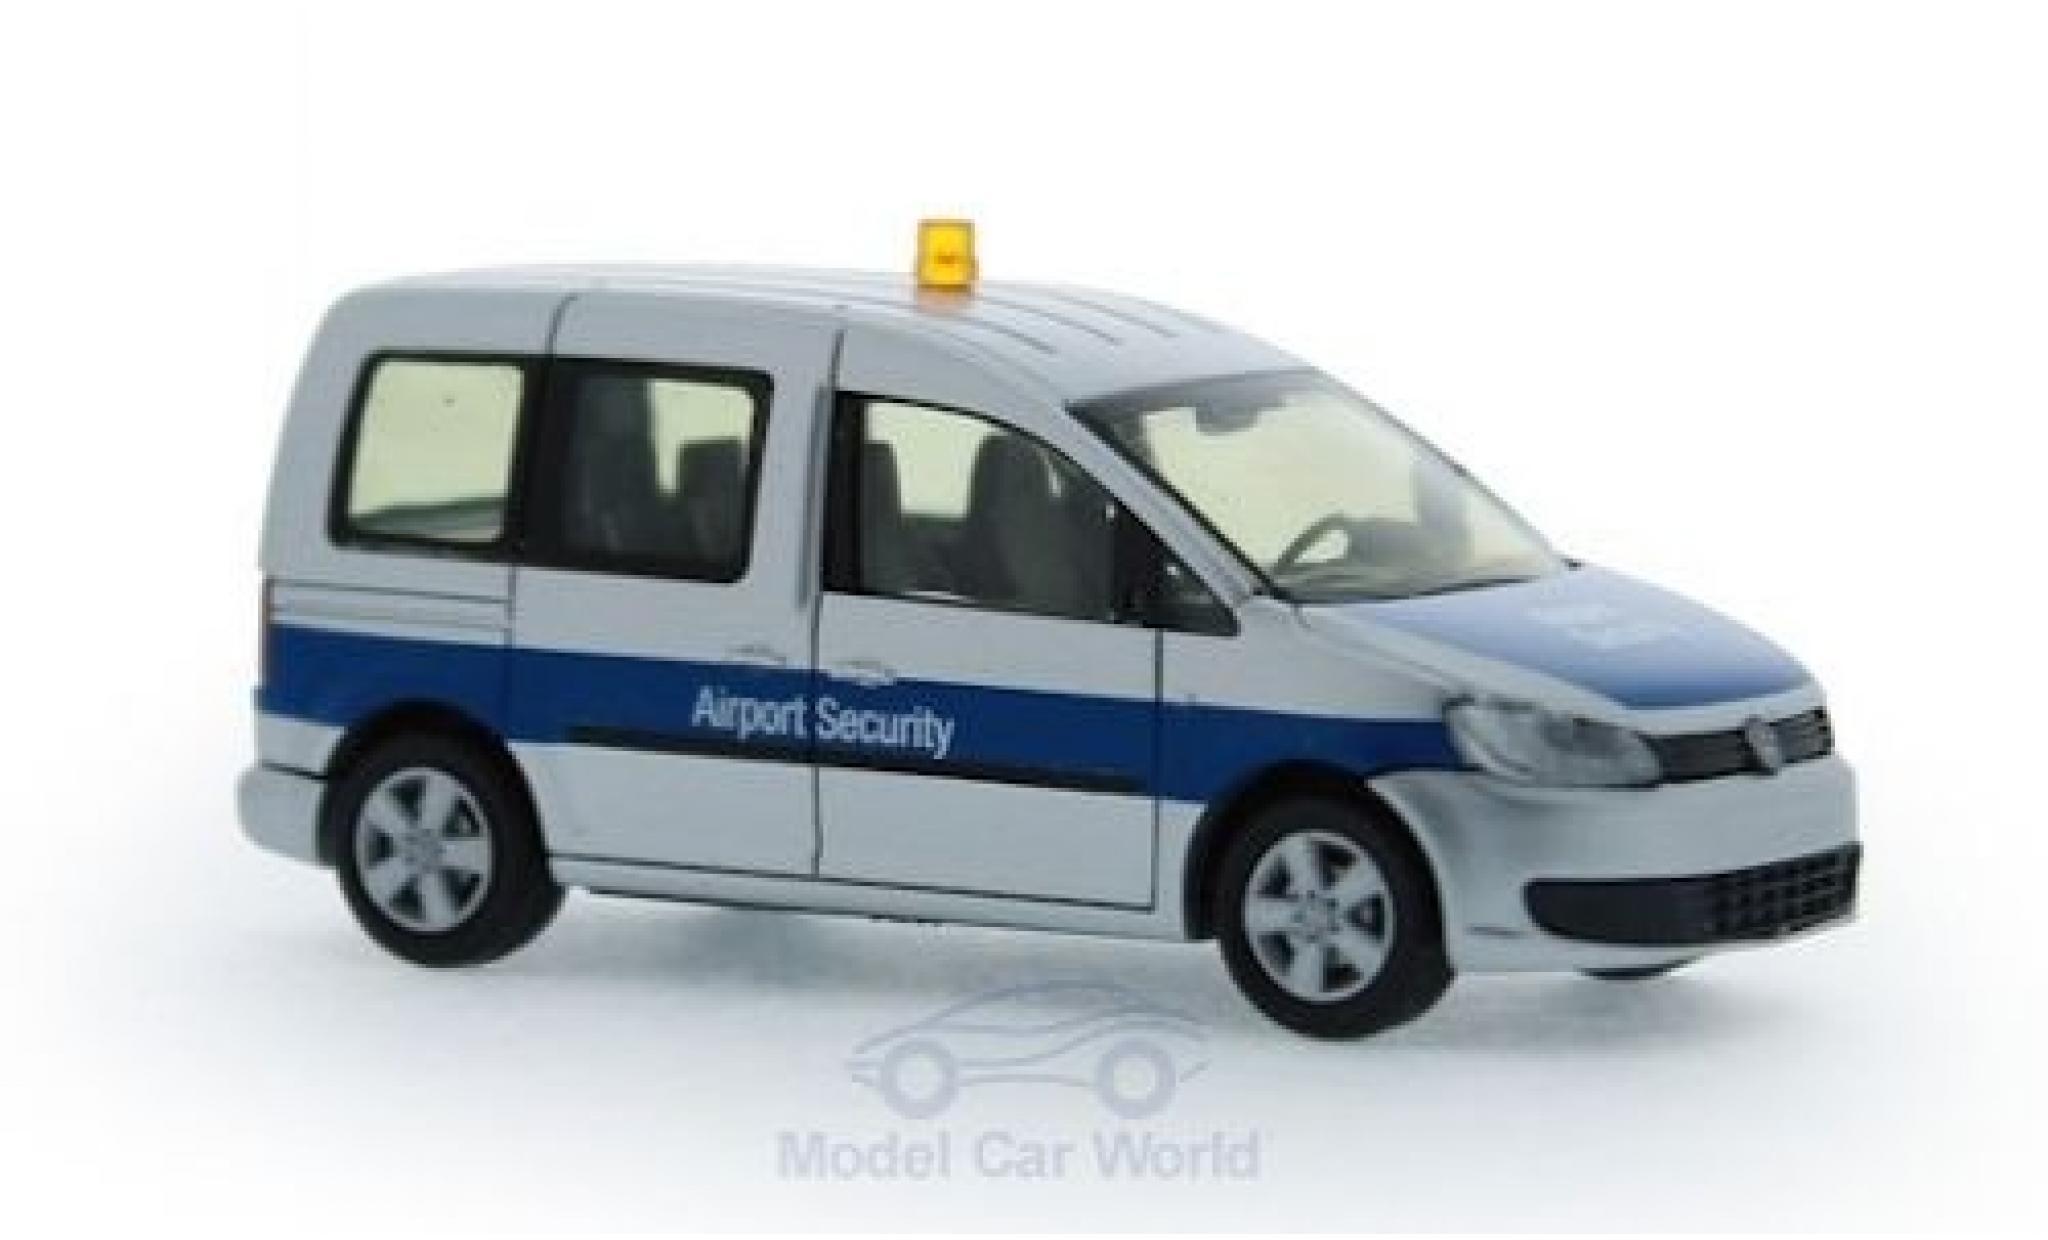 Volkswagen Caddy 1/87 Rietze Airport Security Düsseldorf 2011